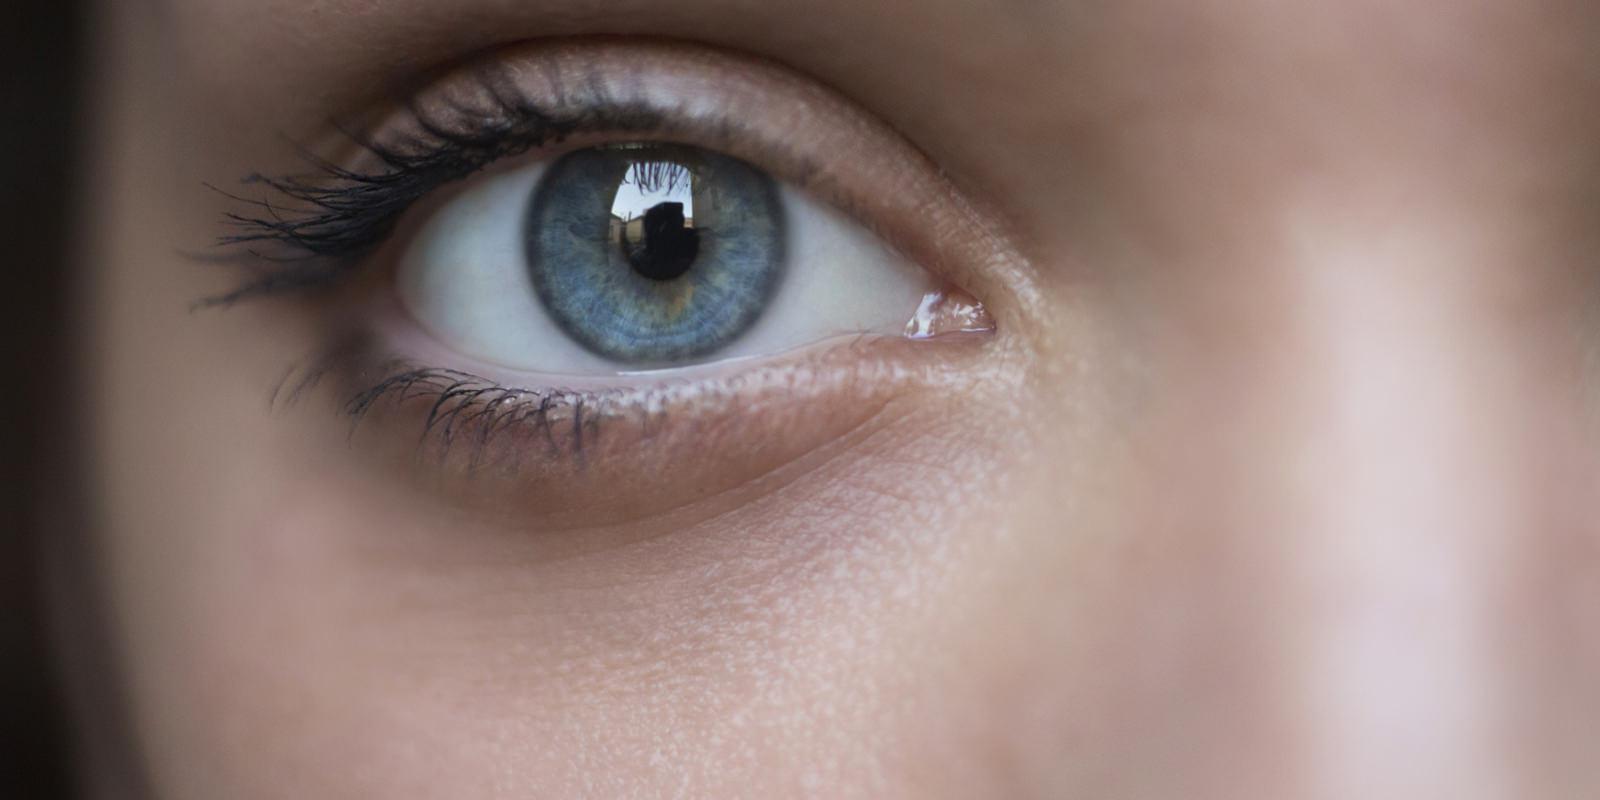 Dashboards - Auge